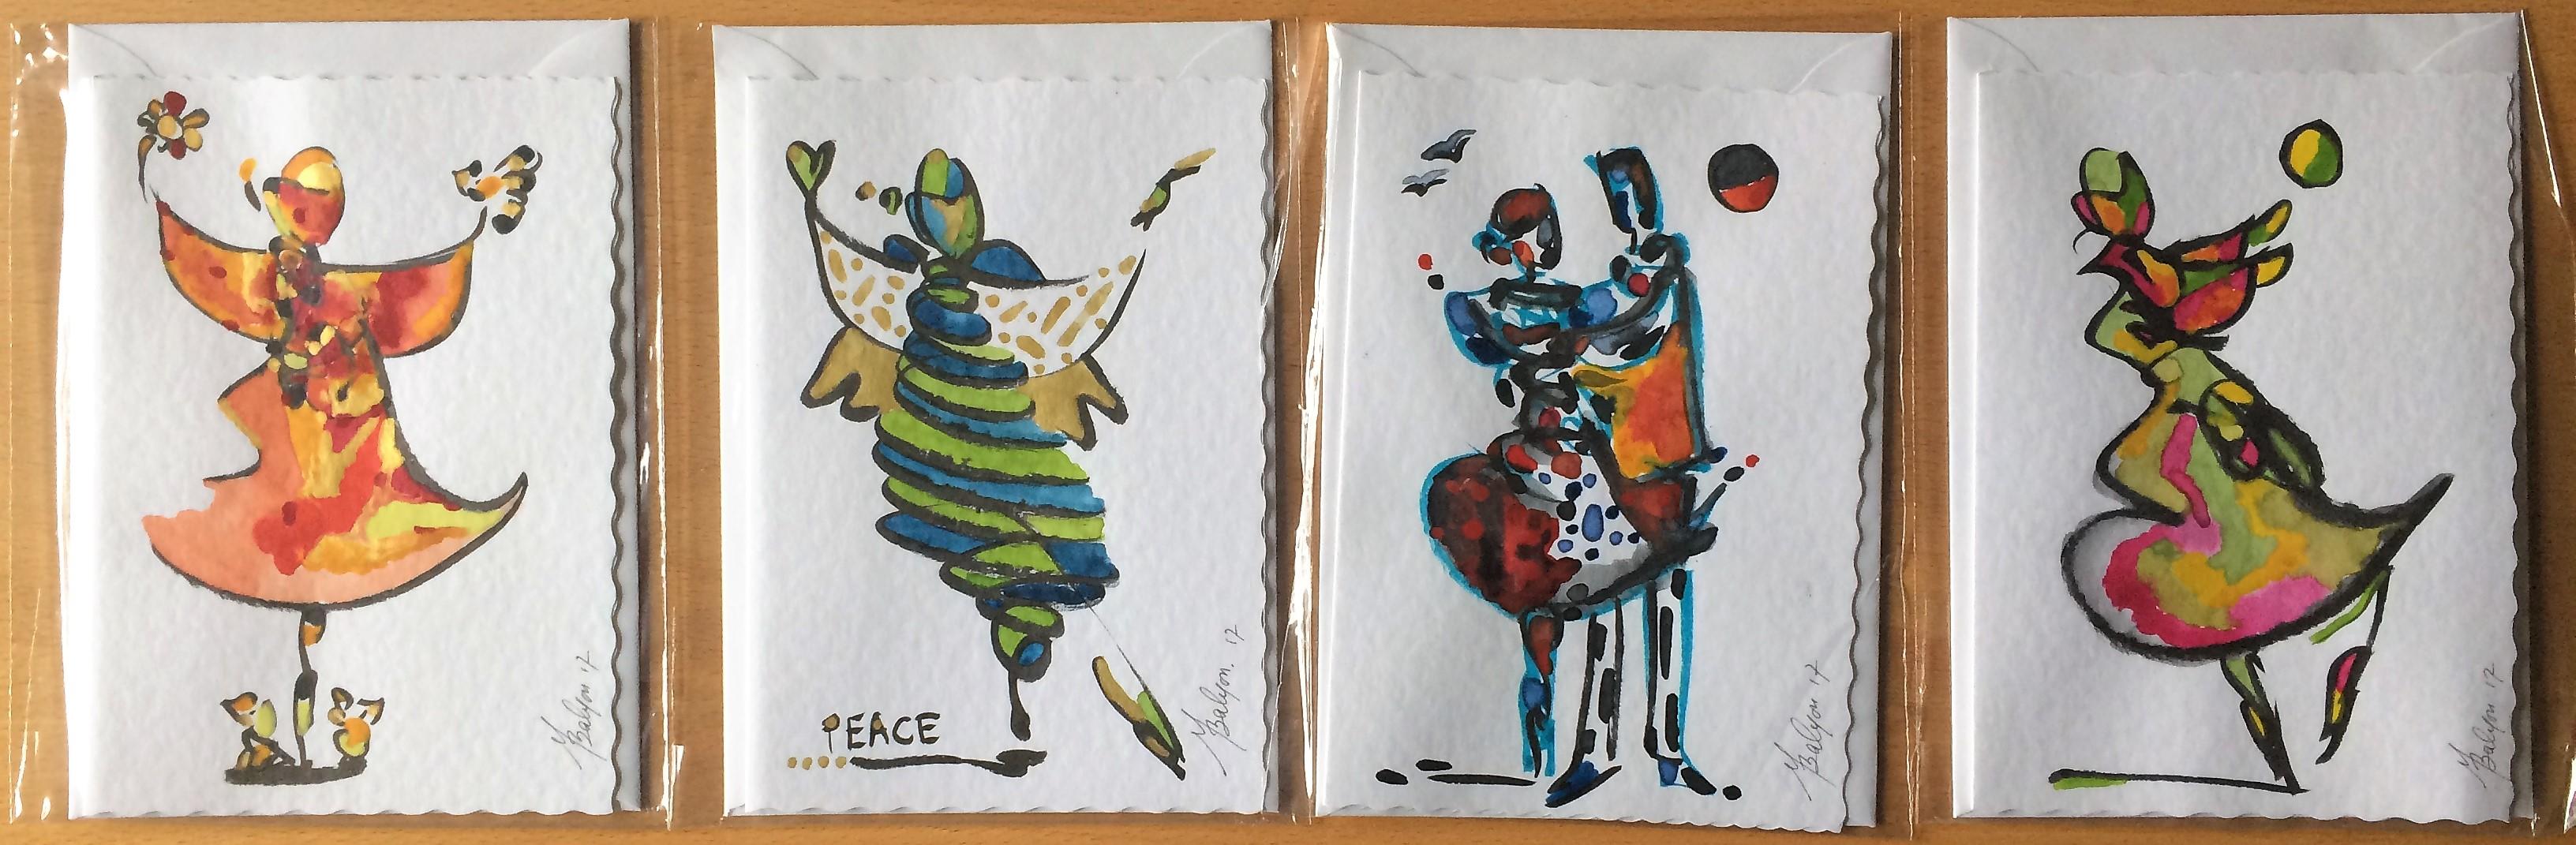 leven cards Set B